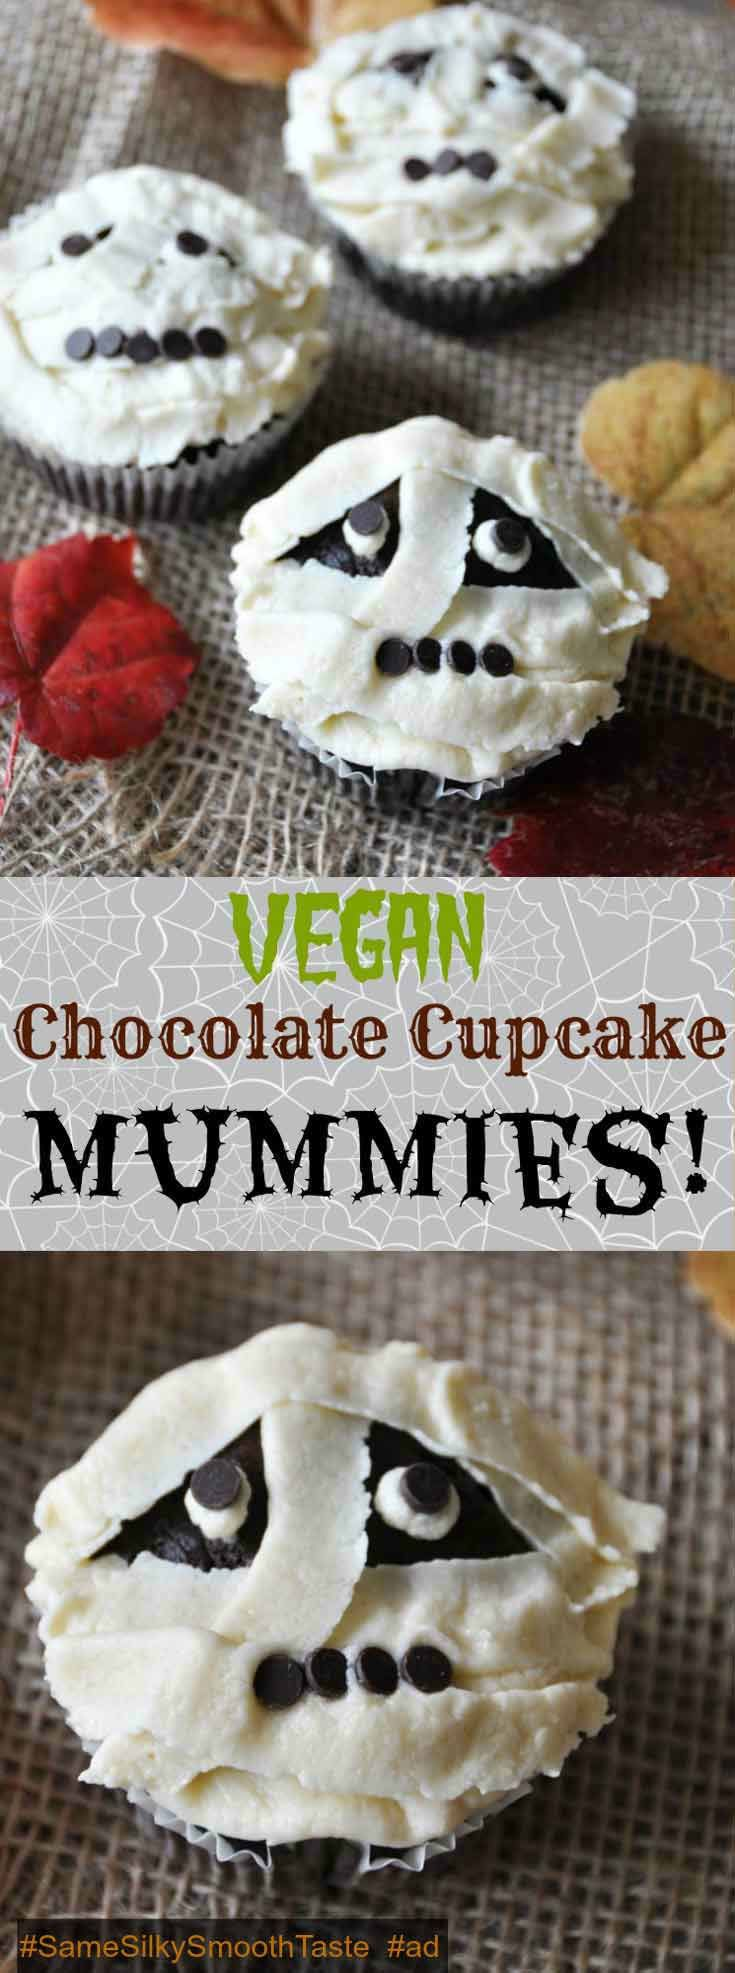 Best 25+ Vegan chocolate cupcakes ideas on Pinterest   Vegan ...